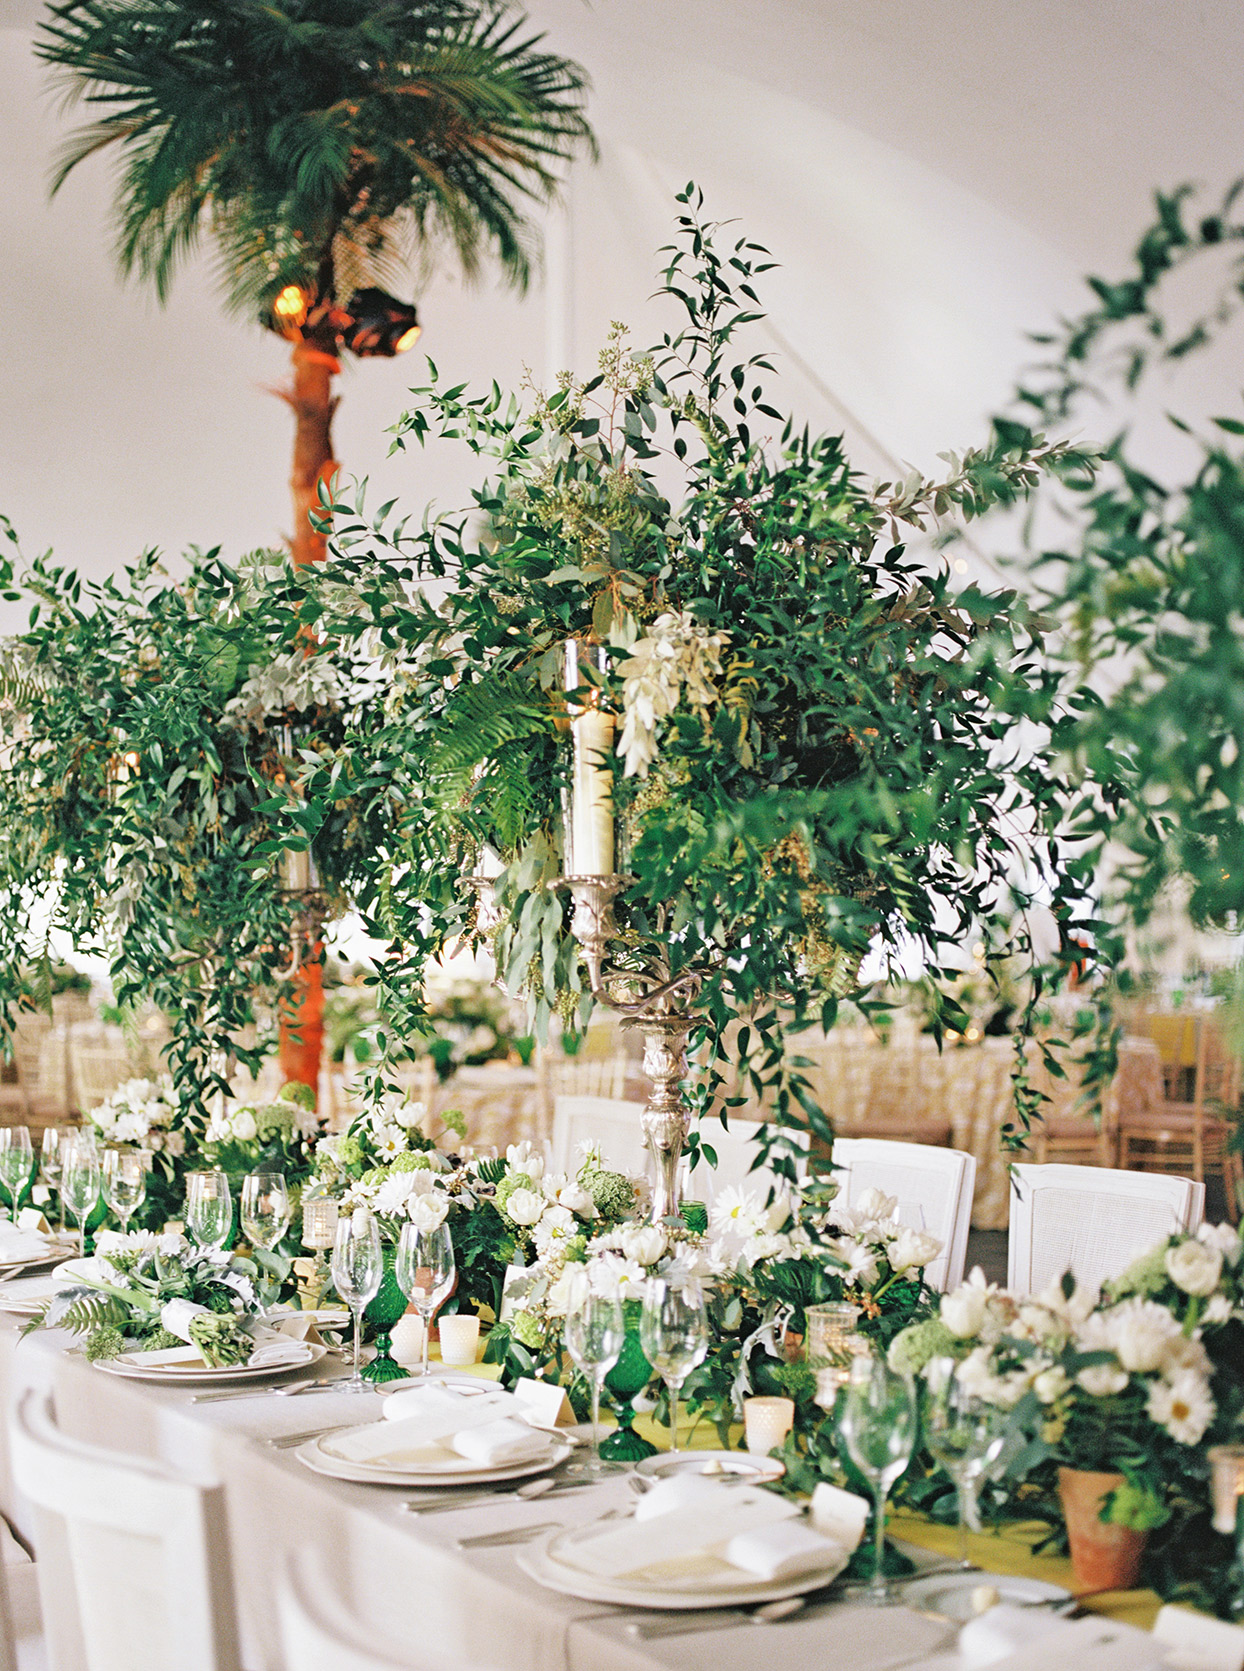 sofia alberto wedding reception centerpieces